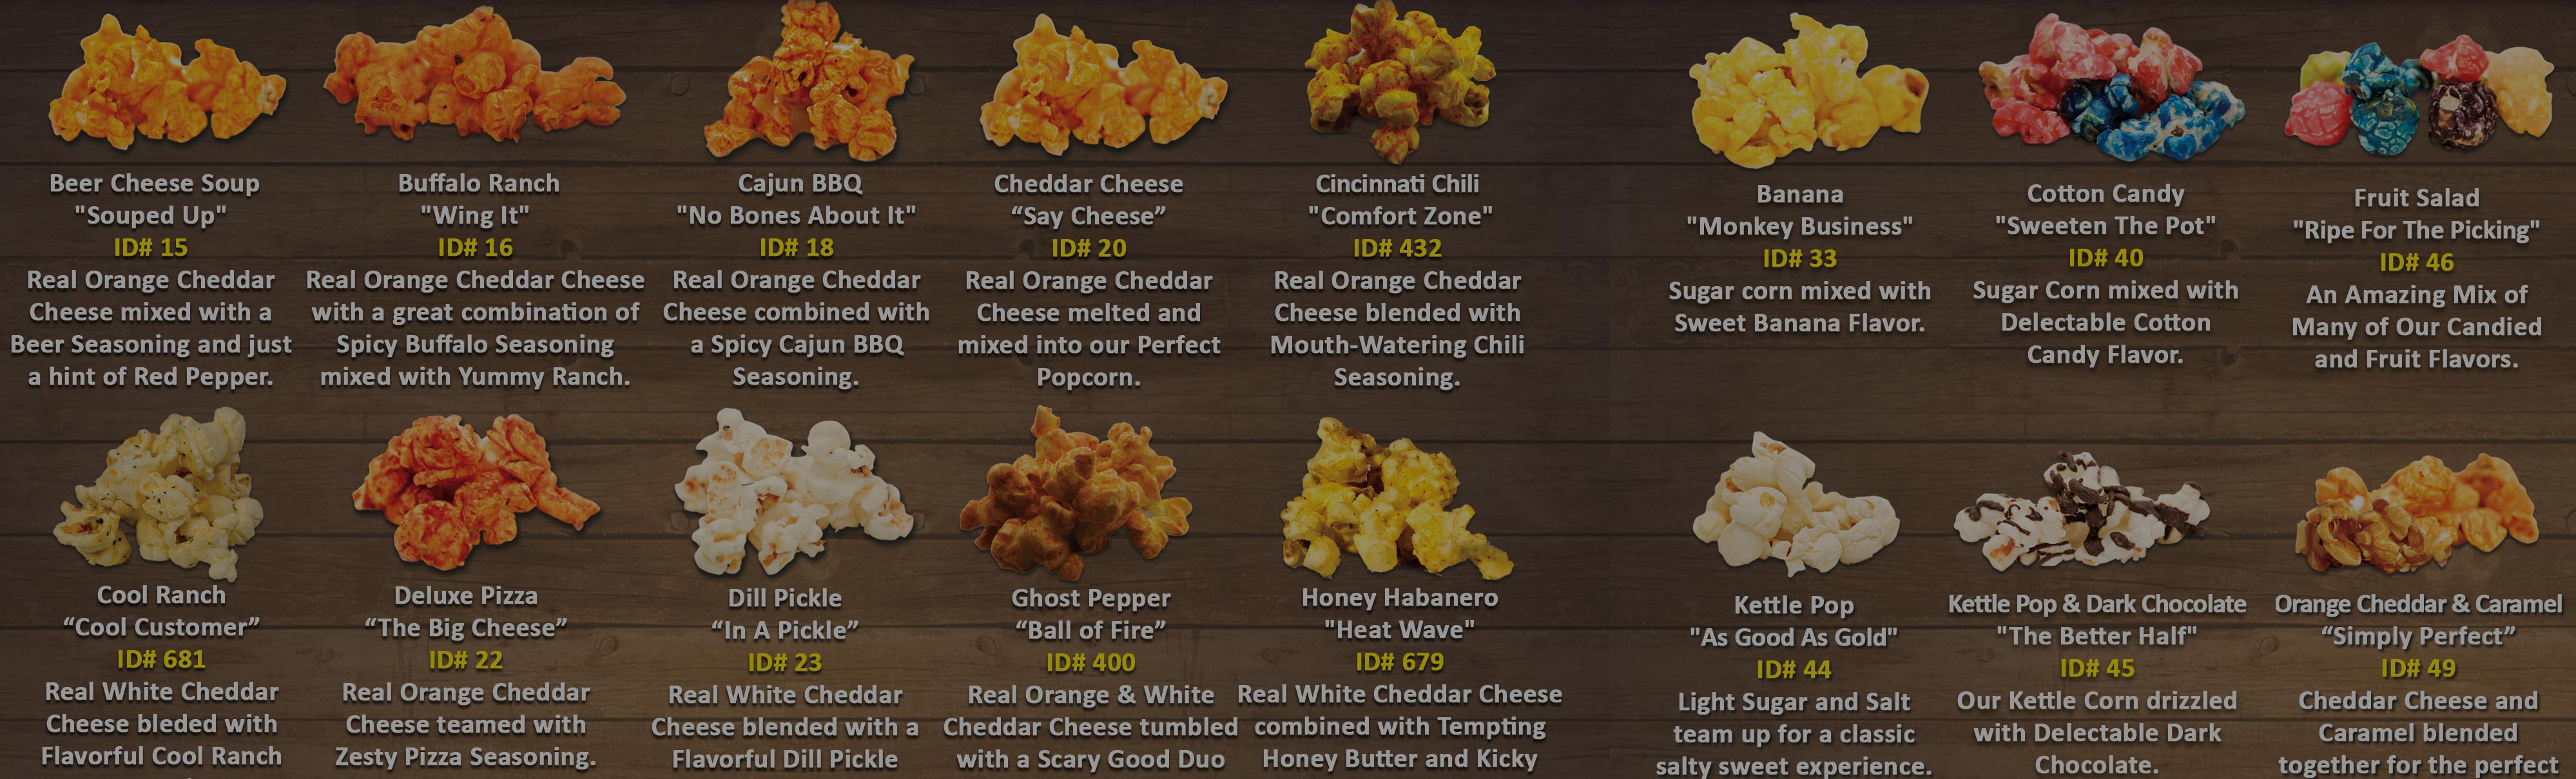 Nom Nom Popcorn Feb. 15-28